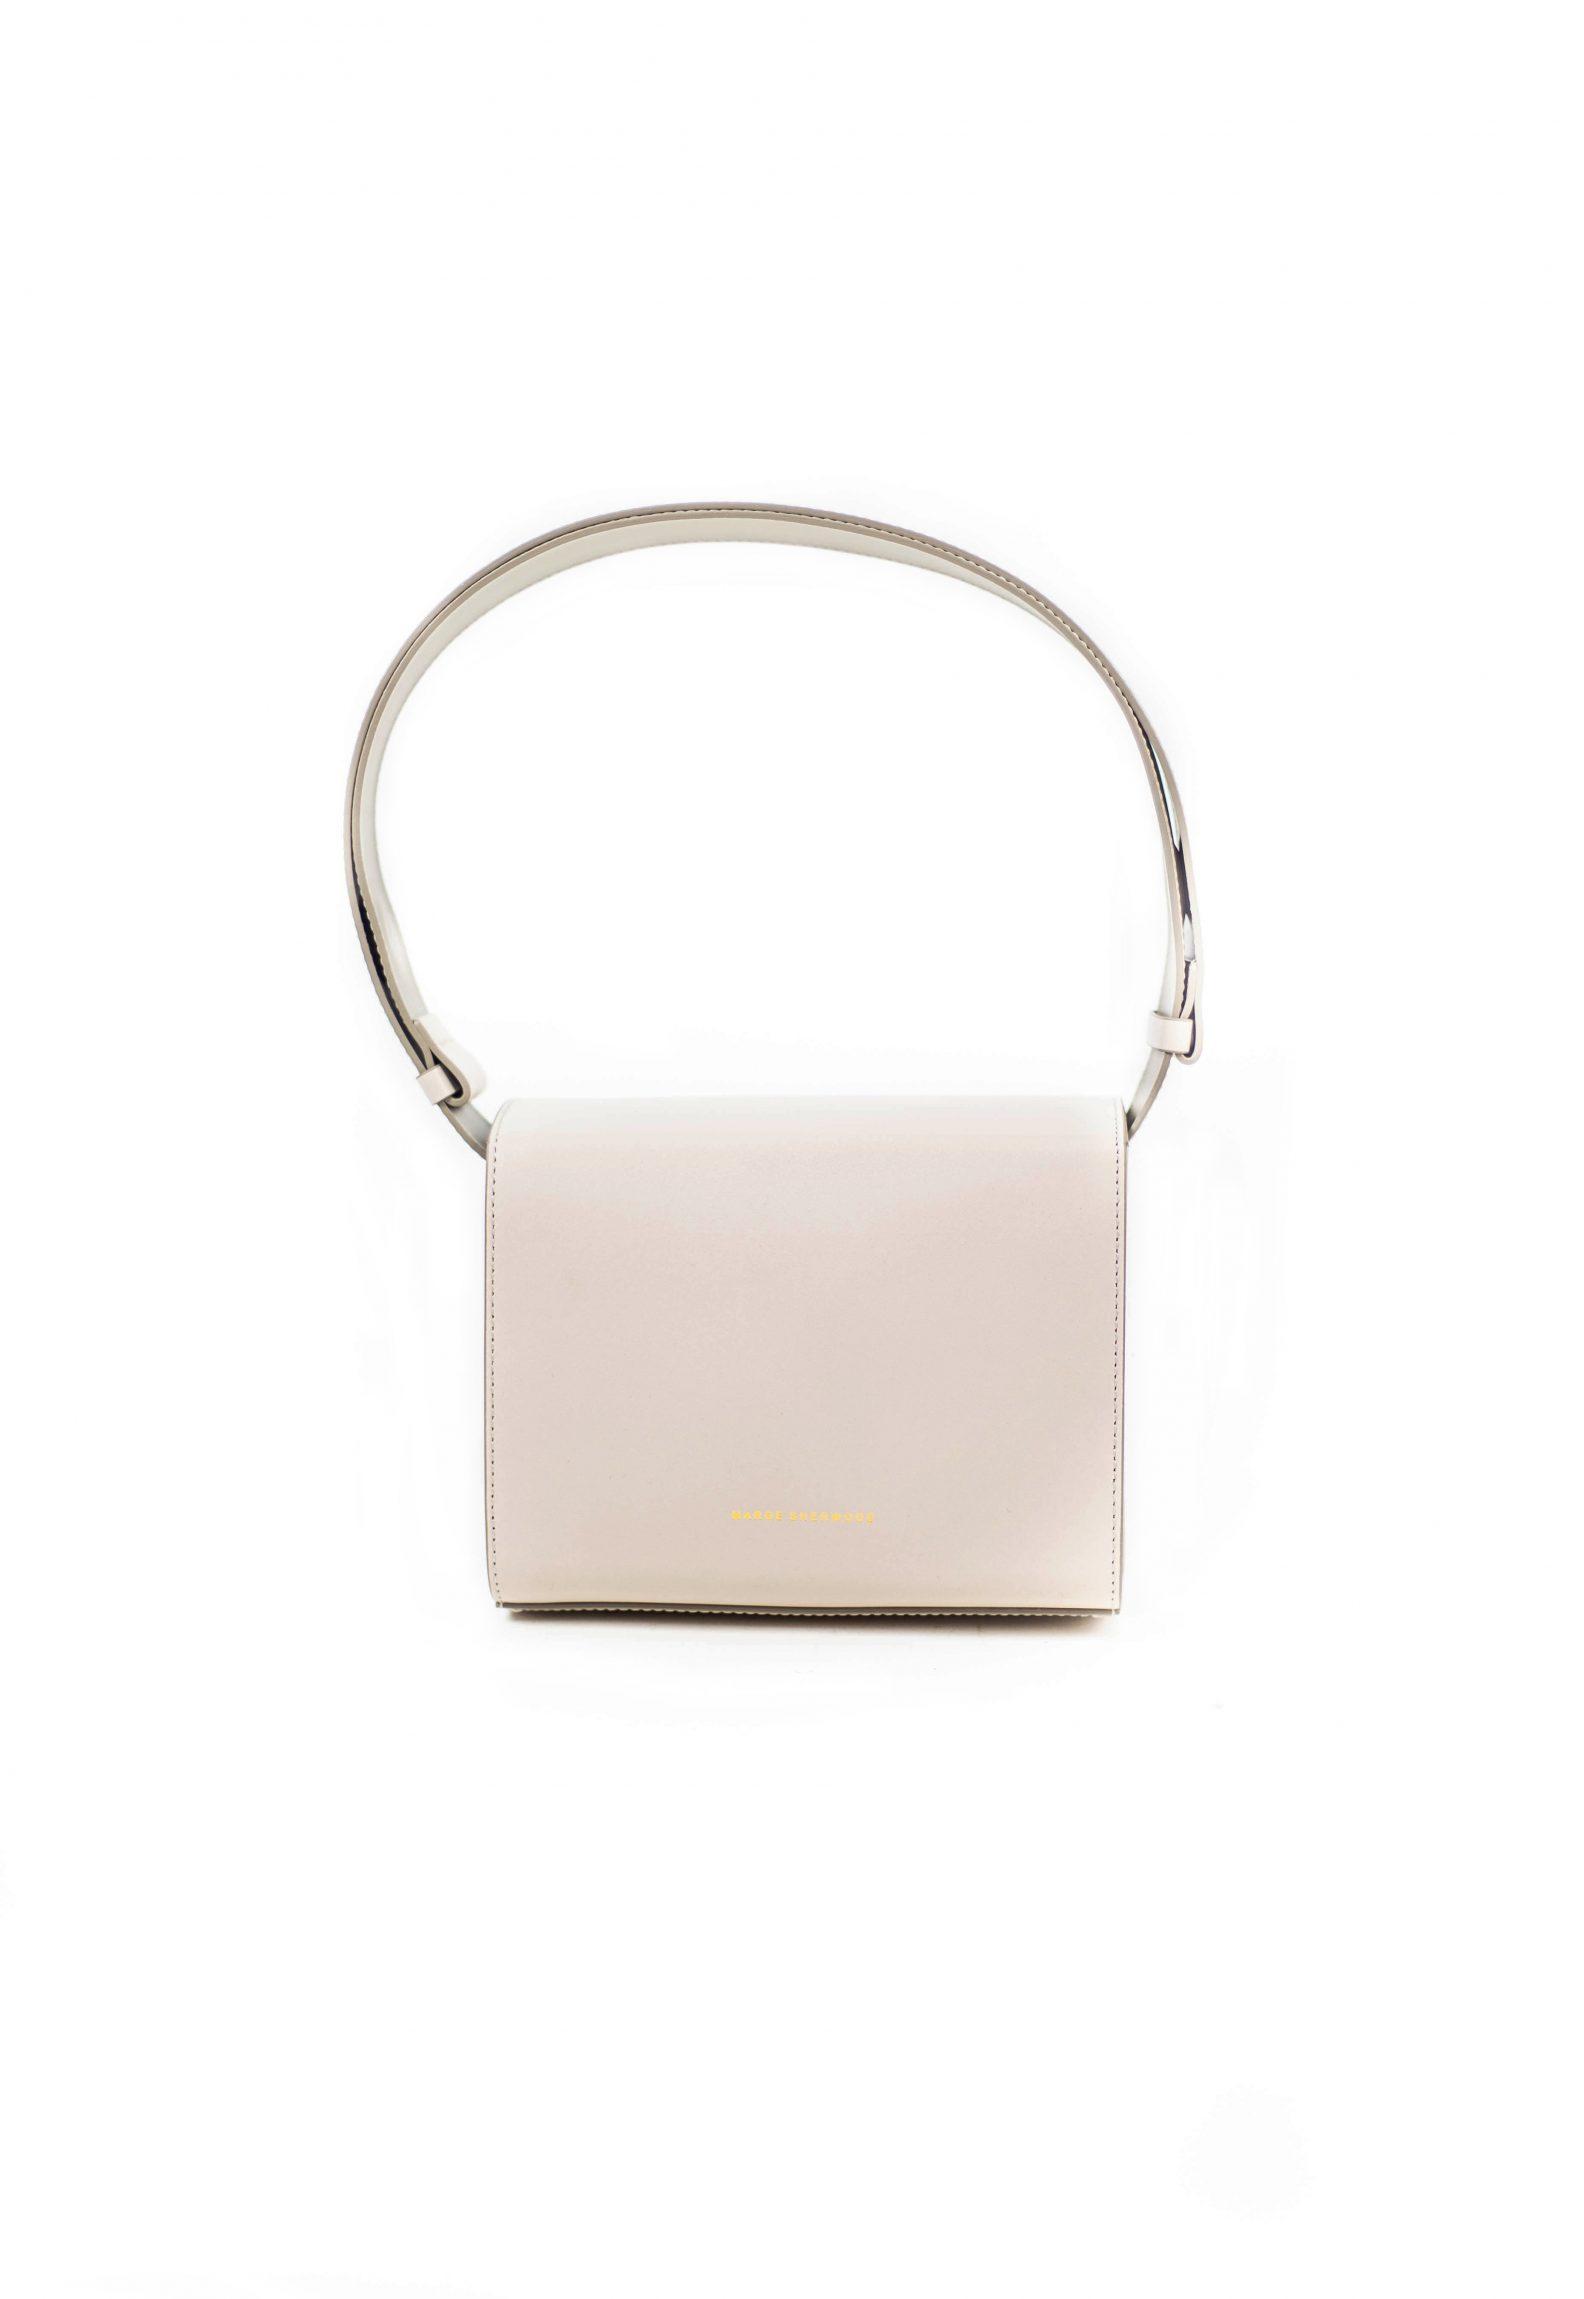 3-sac-cuir-rabat-gris-clair-affaires-etrangeres-paris-mode-coreenne-besides-kimchi-jpg ;